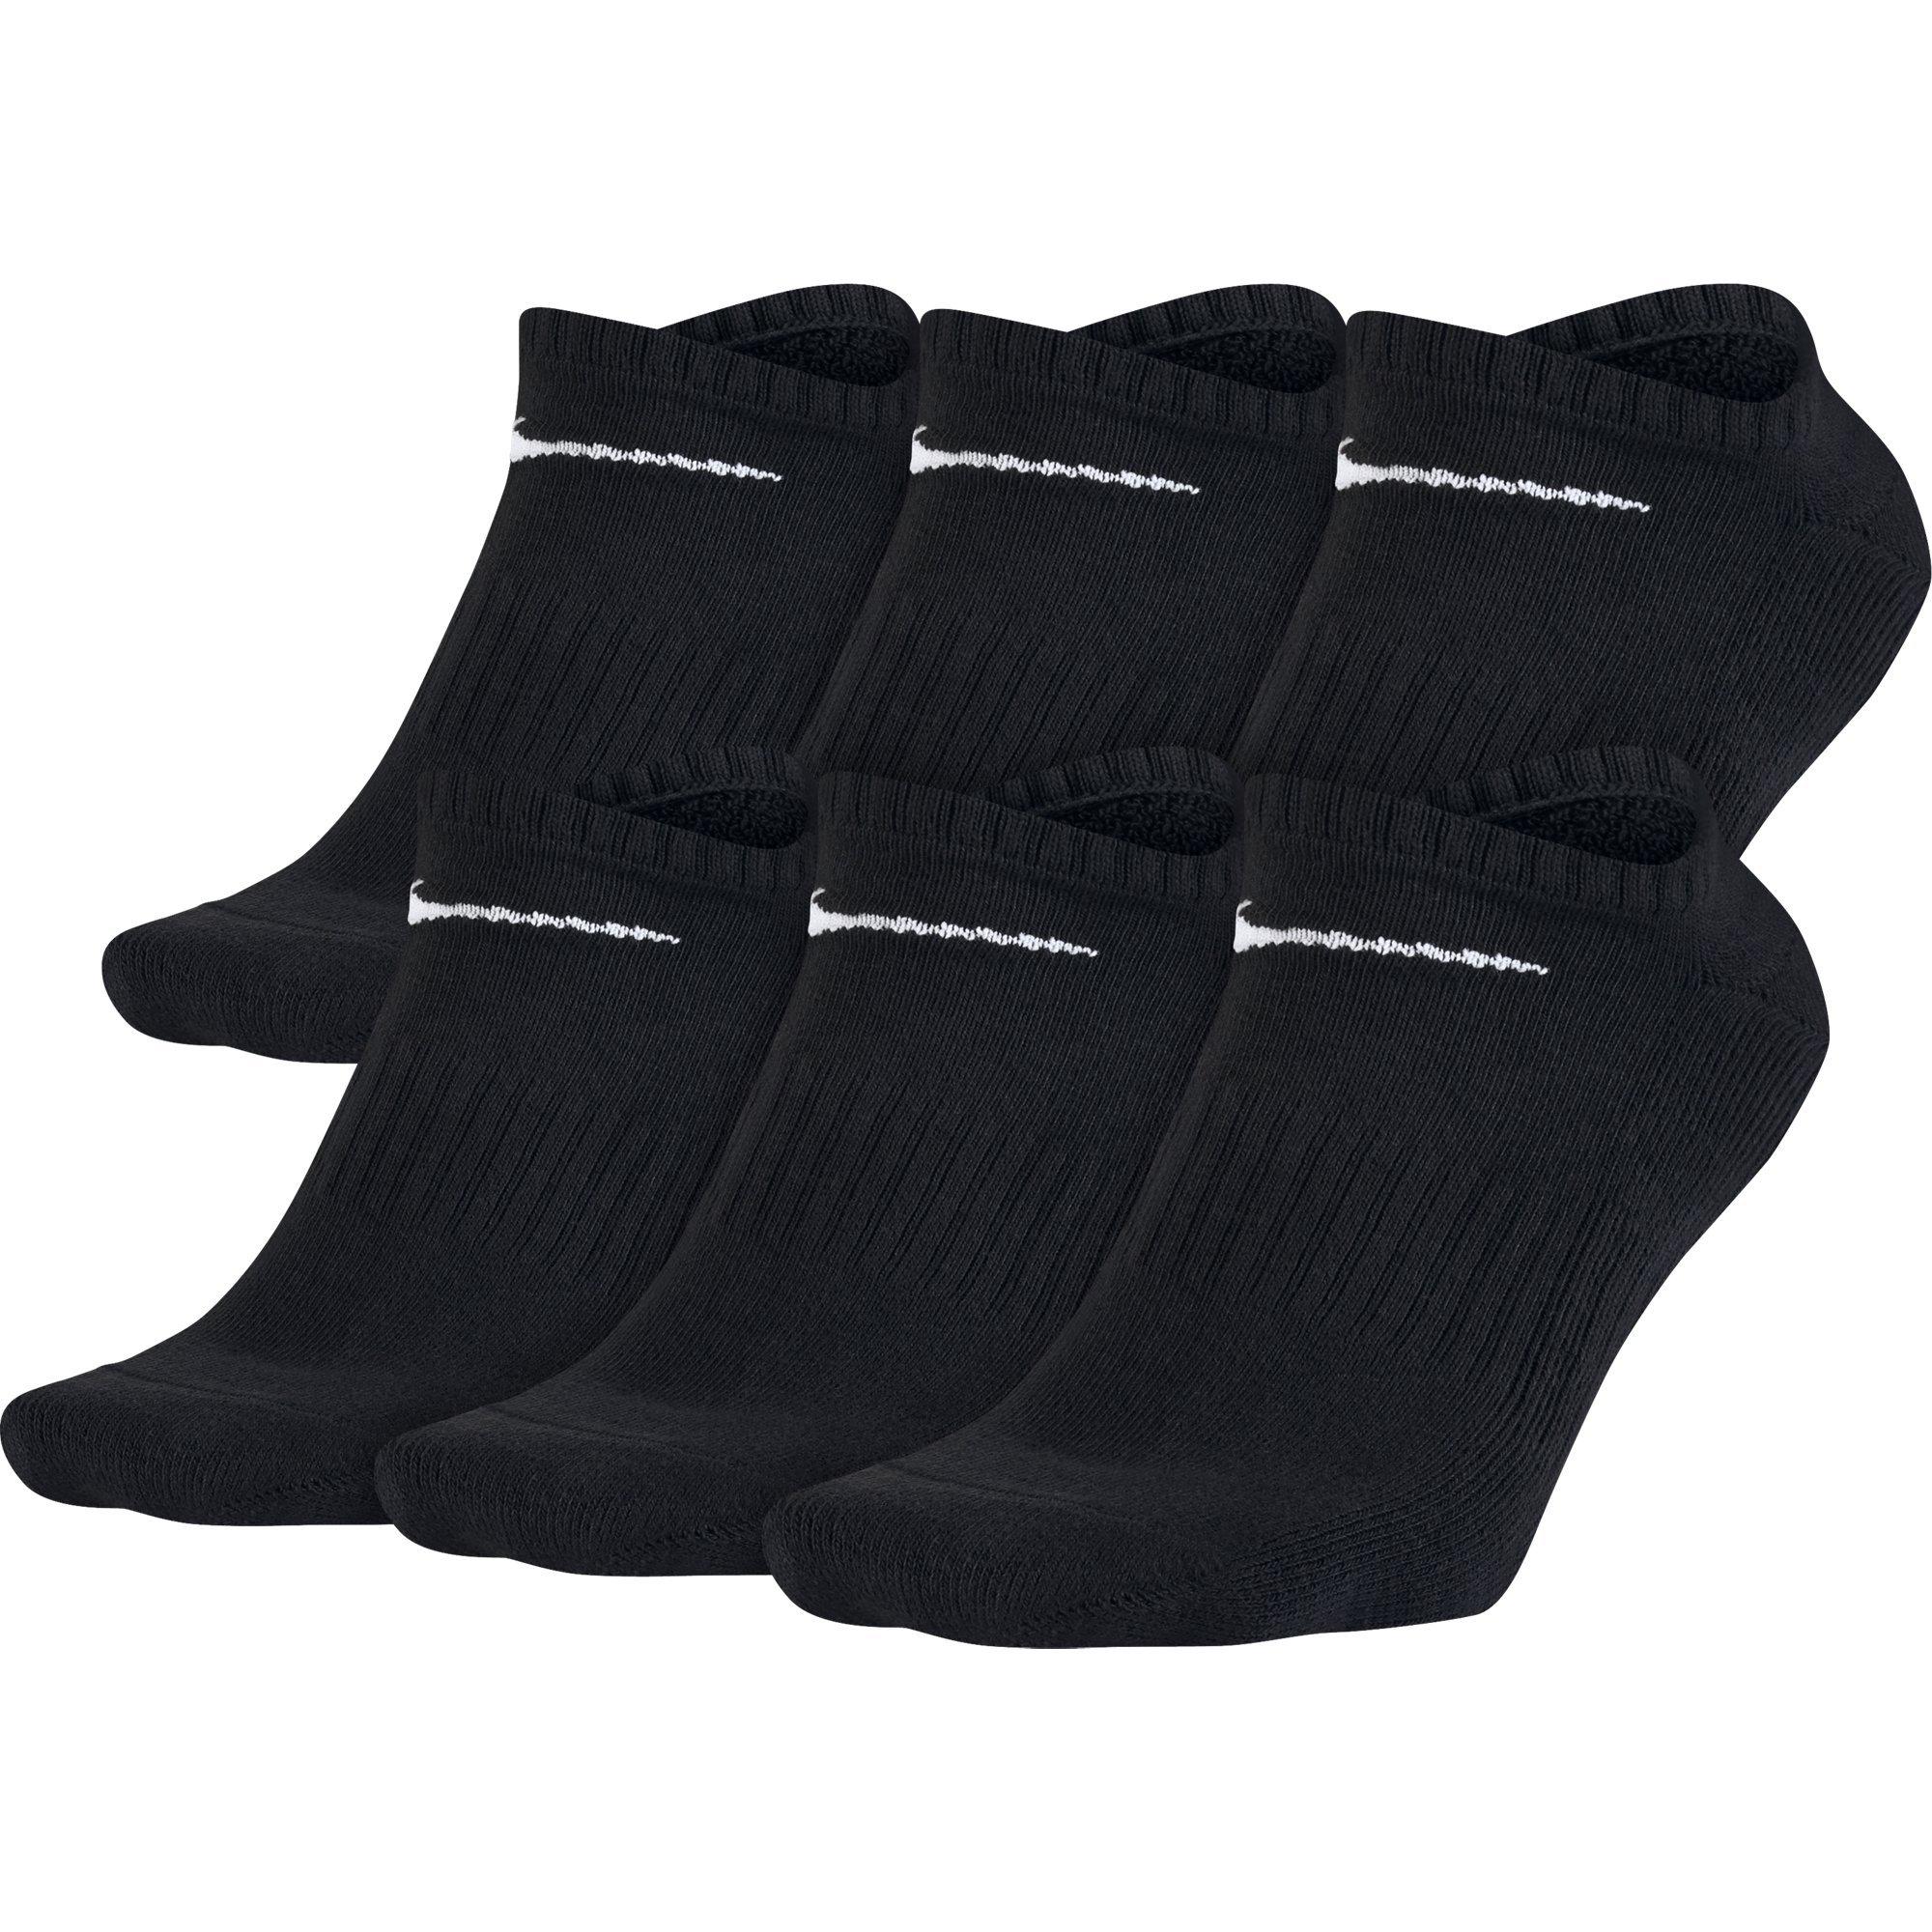 NIKE Unisex Performance Cushion No-Show Socks with Band (6 Pairs), Black/White, Medium by Nike